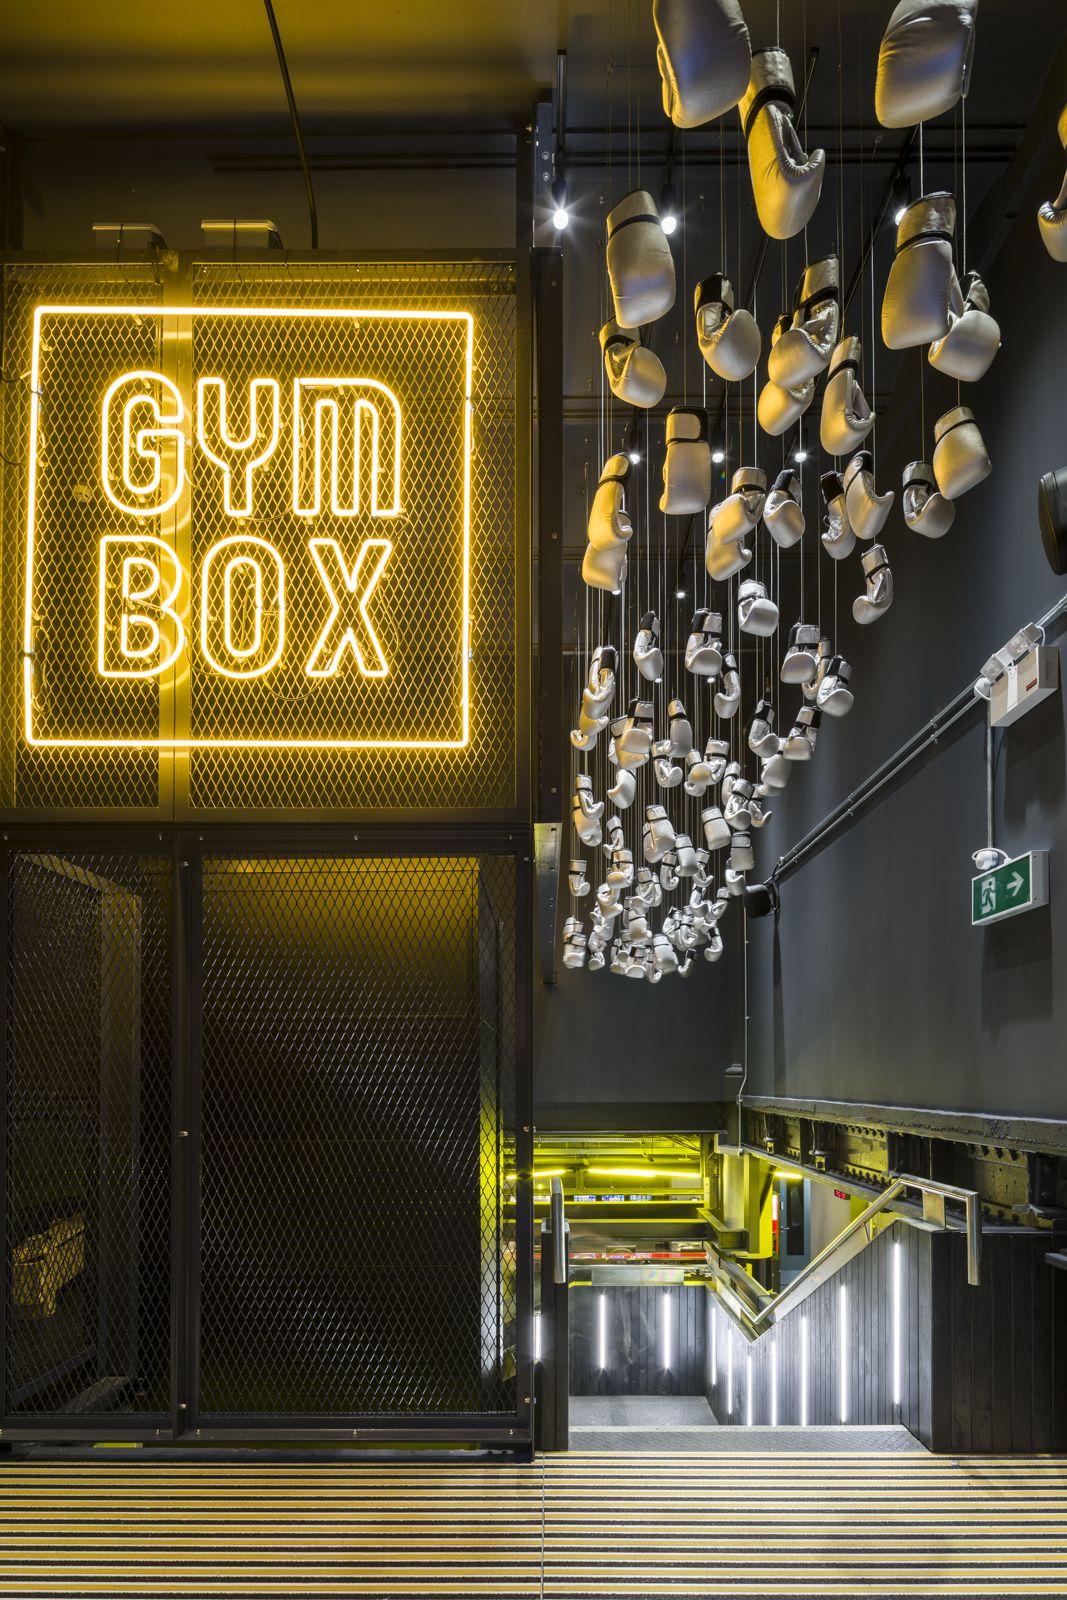 Project A M P Director Patrick Mckinney Discusses Gymbox Victoria Designcurial Bảng Hiệu Gym Neon